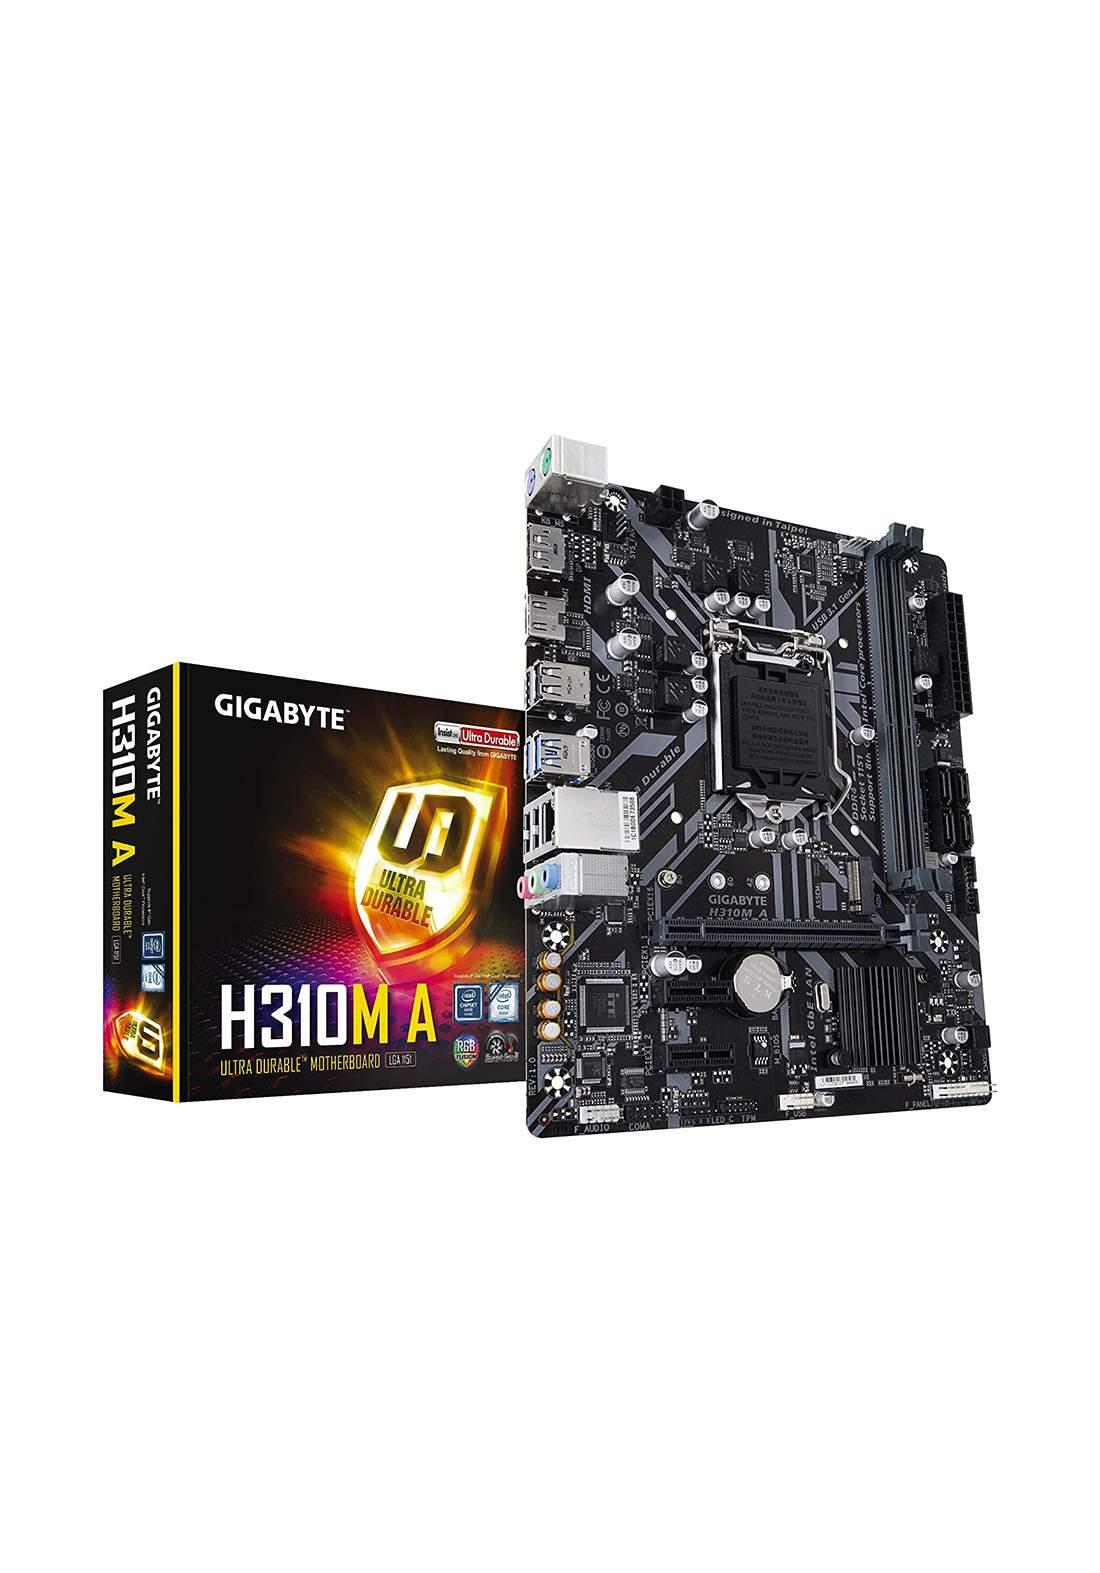 Gigabyte H310MA Motherboard -Black لوحة الام